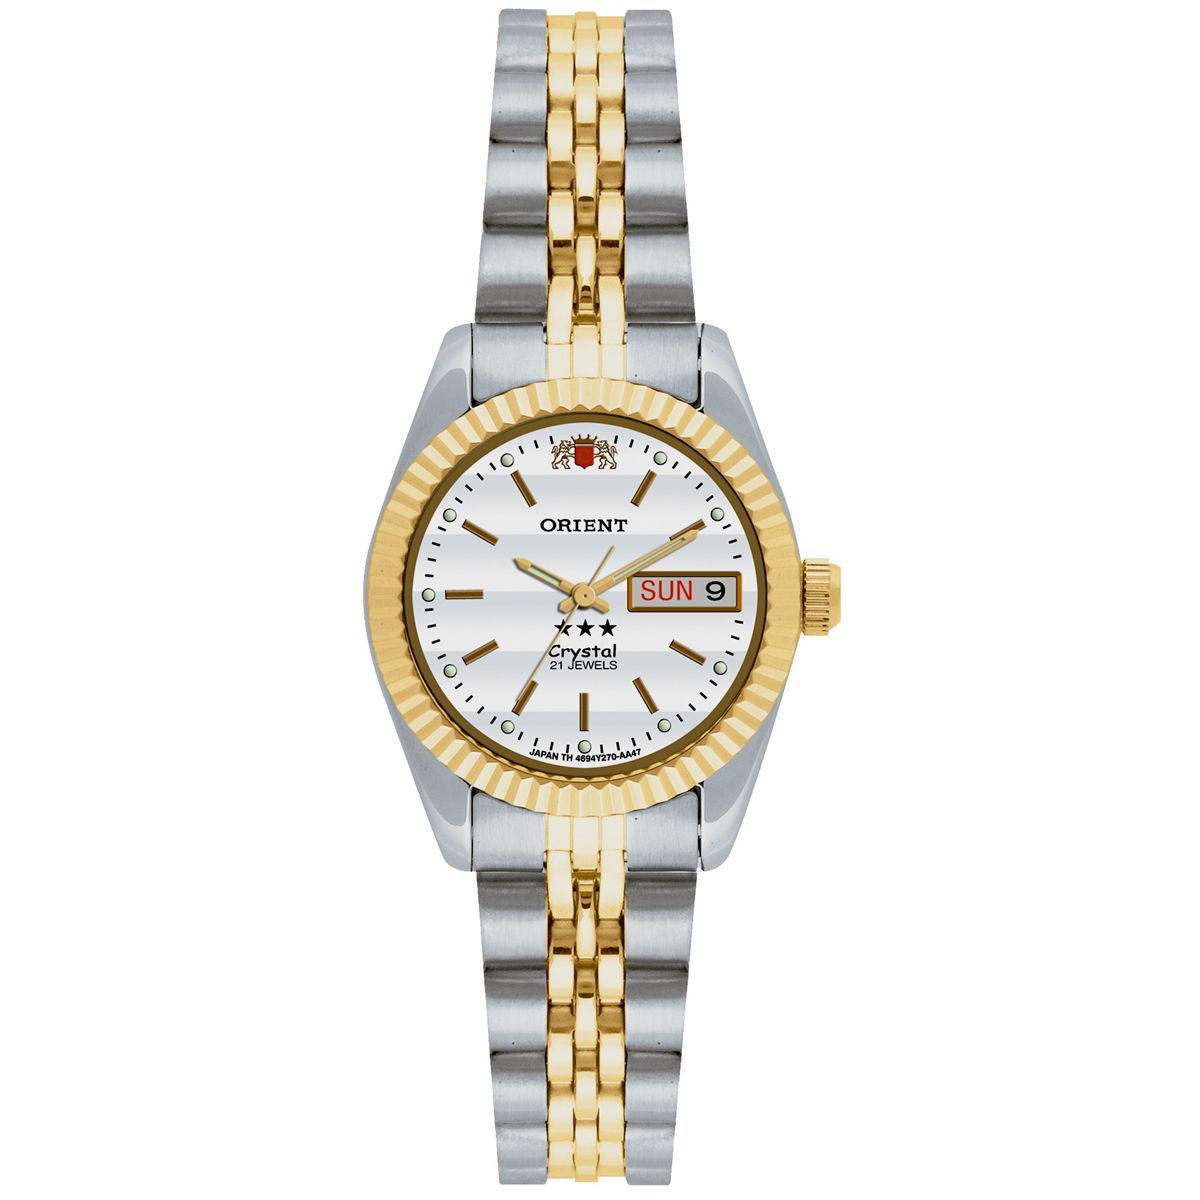 f443d5dfb5a Relógio Feminino Orient Automático - 559EB3X B1SK - Relógio Feminino ...